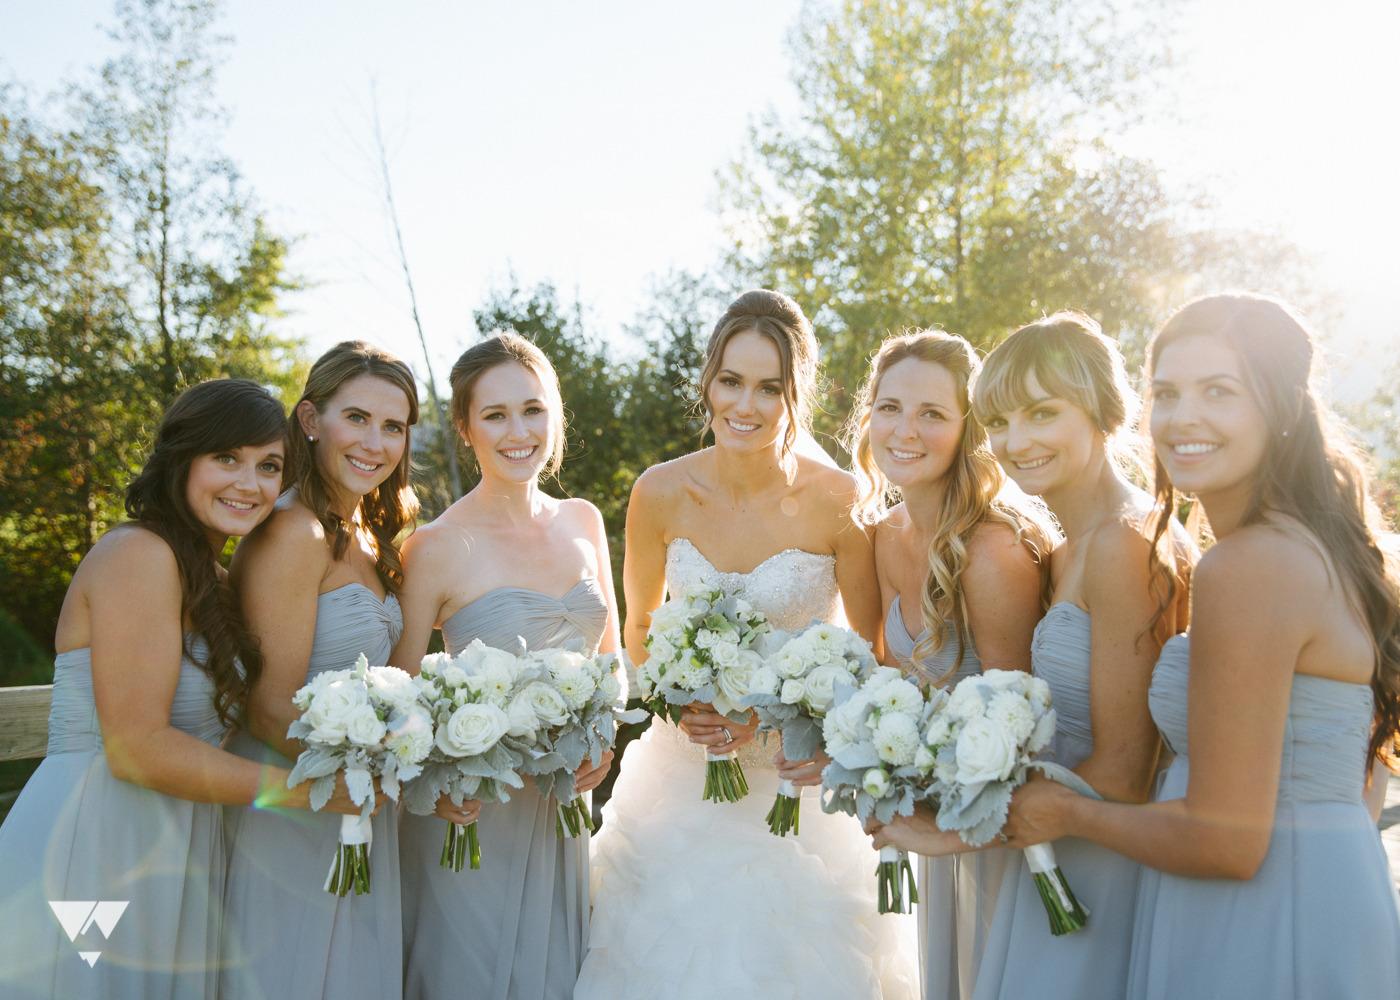 Tianna-Tran-Vancouver-Wedding-Makeup-Artist-Bridal-013.jpg